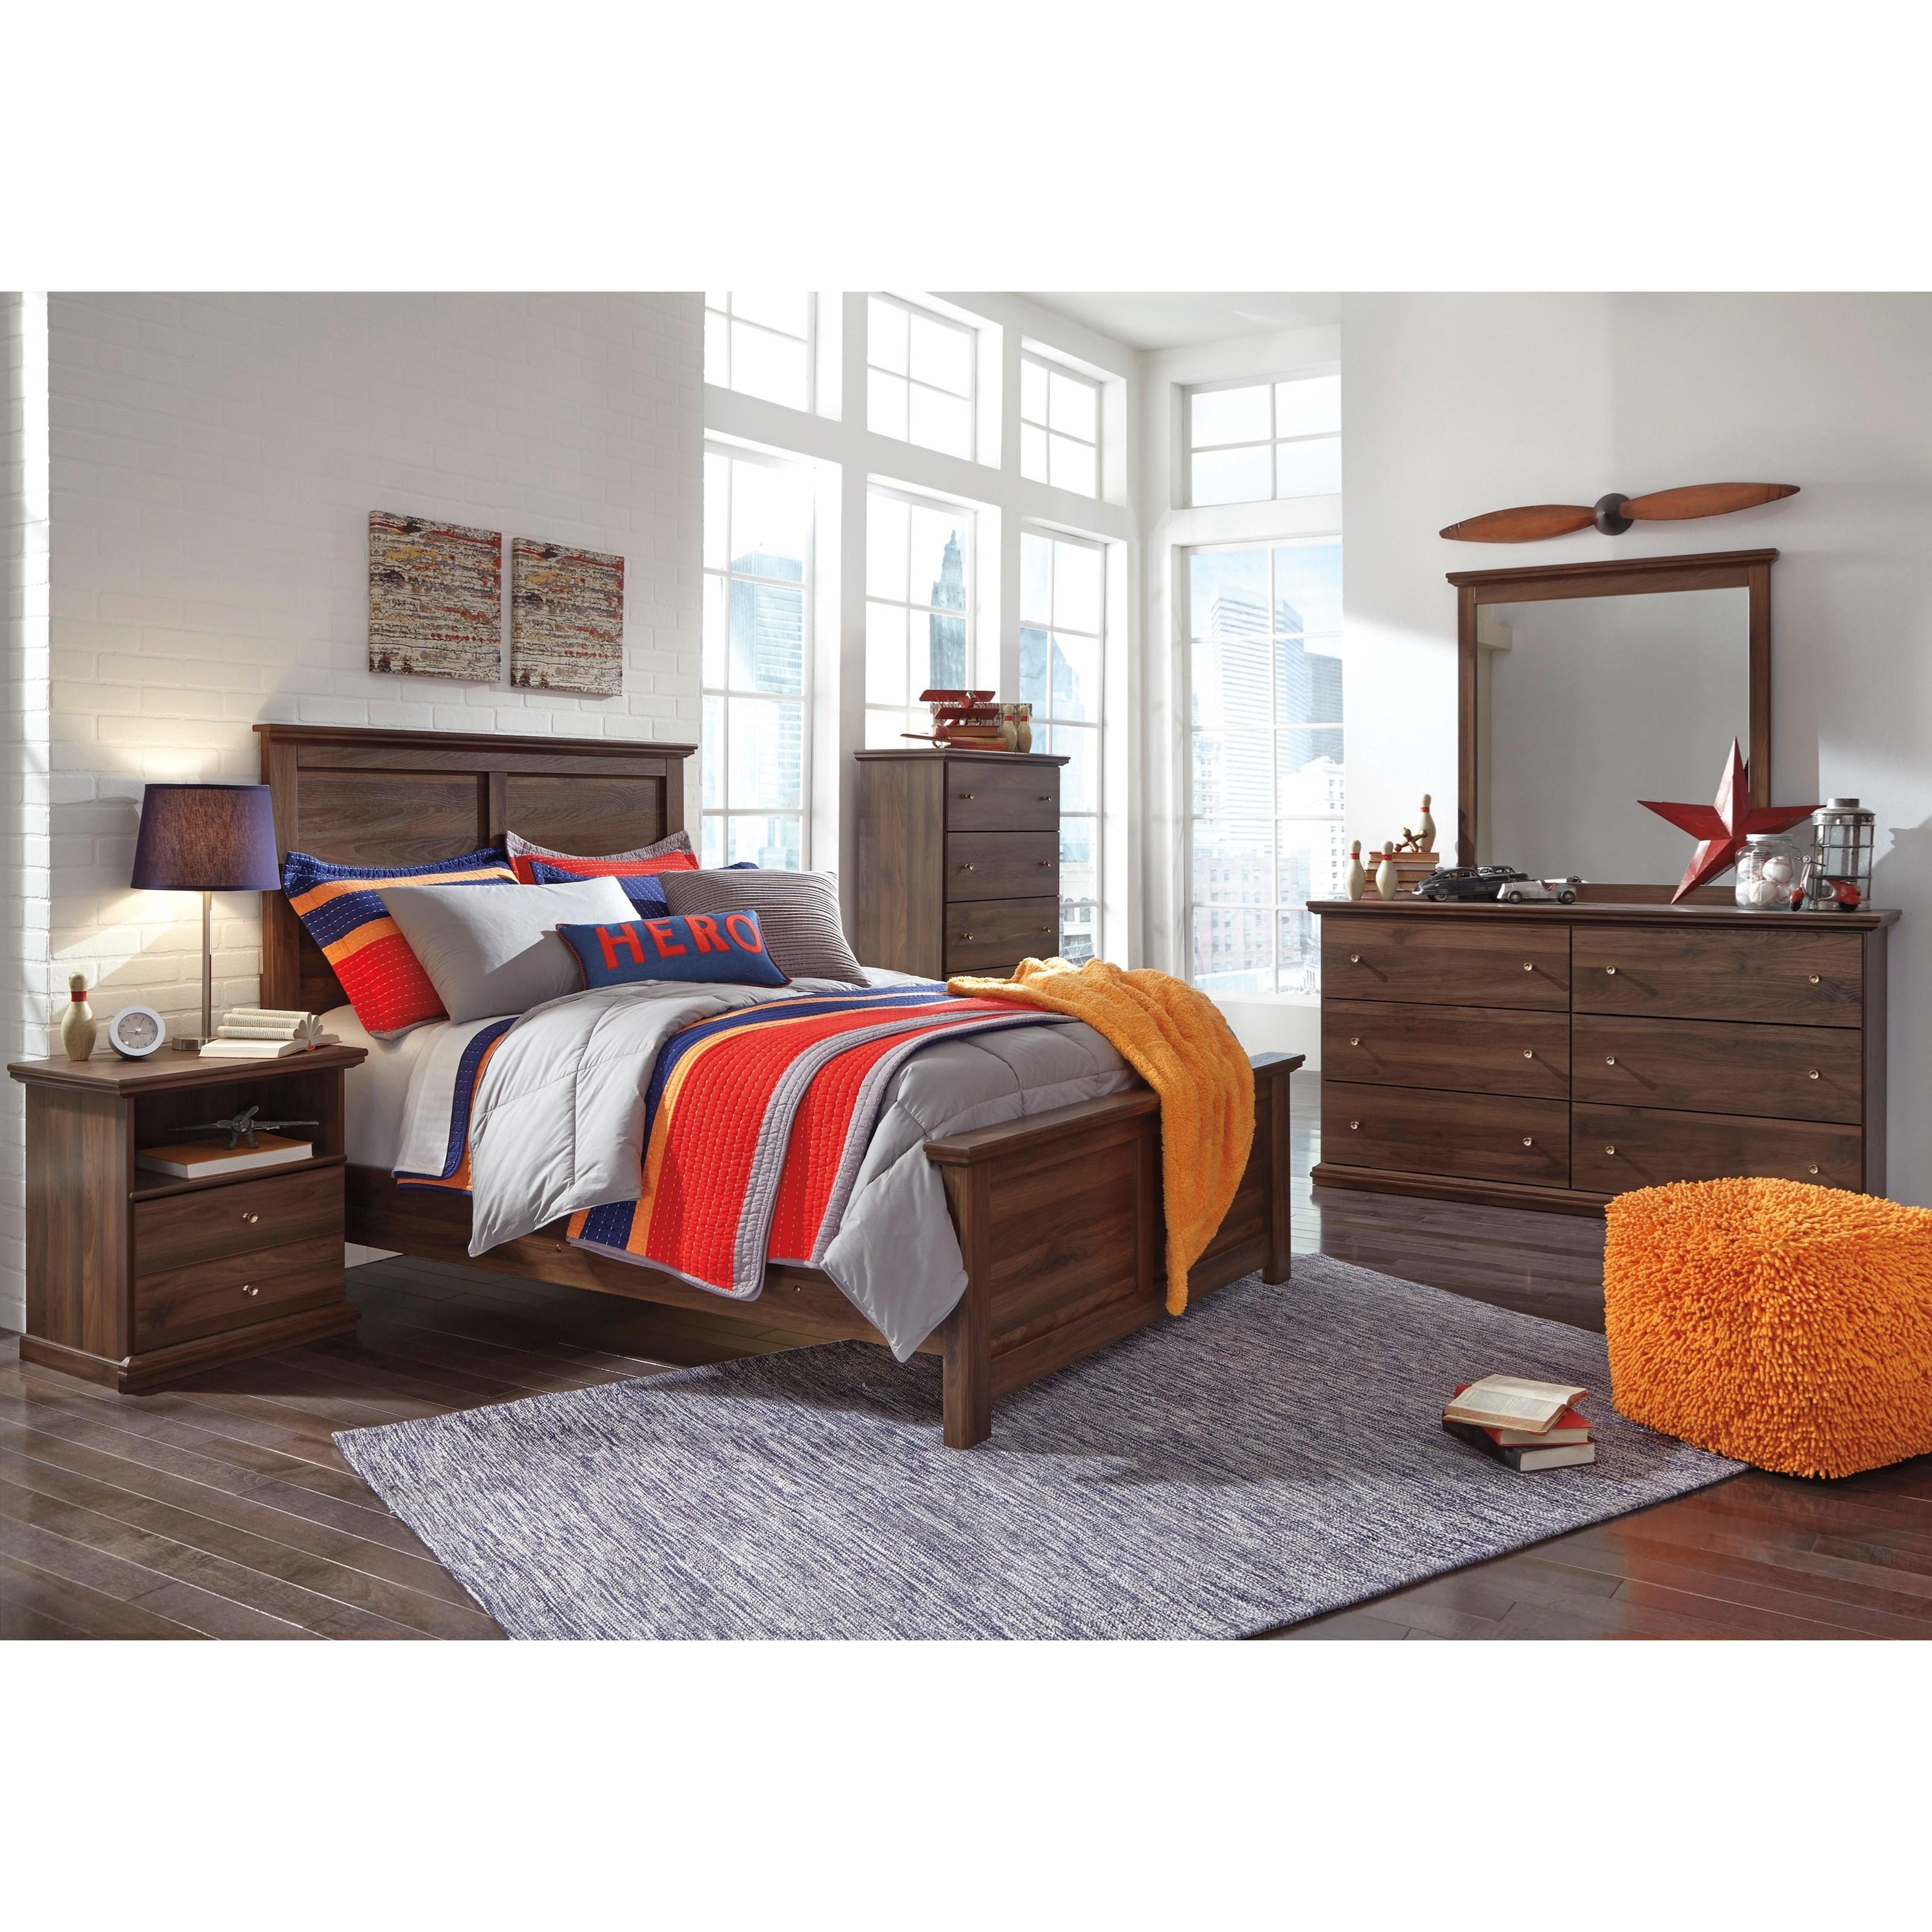 Signature Design by Ashley Burminson Full Bedroom Group - Item Number: B135 F Bedroom Group 1